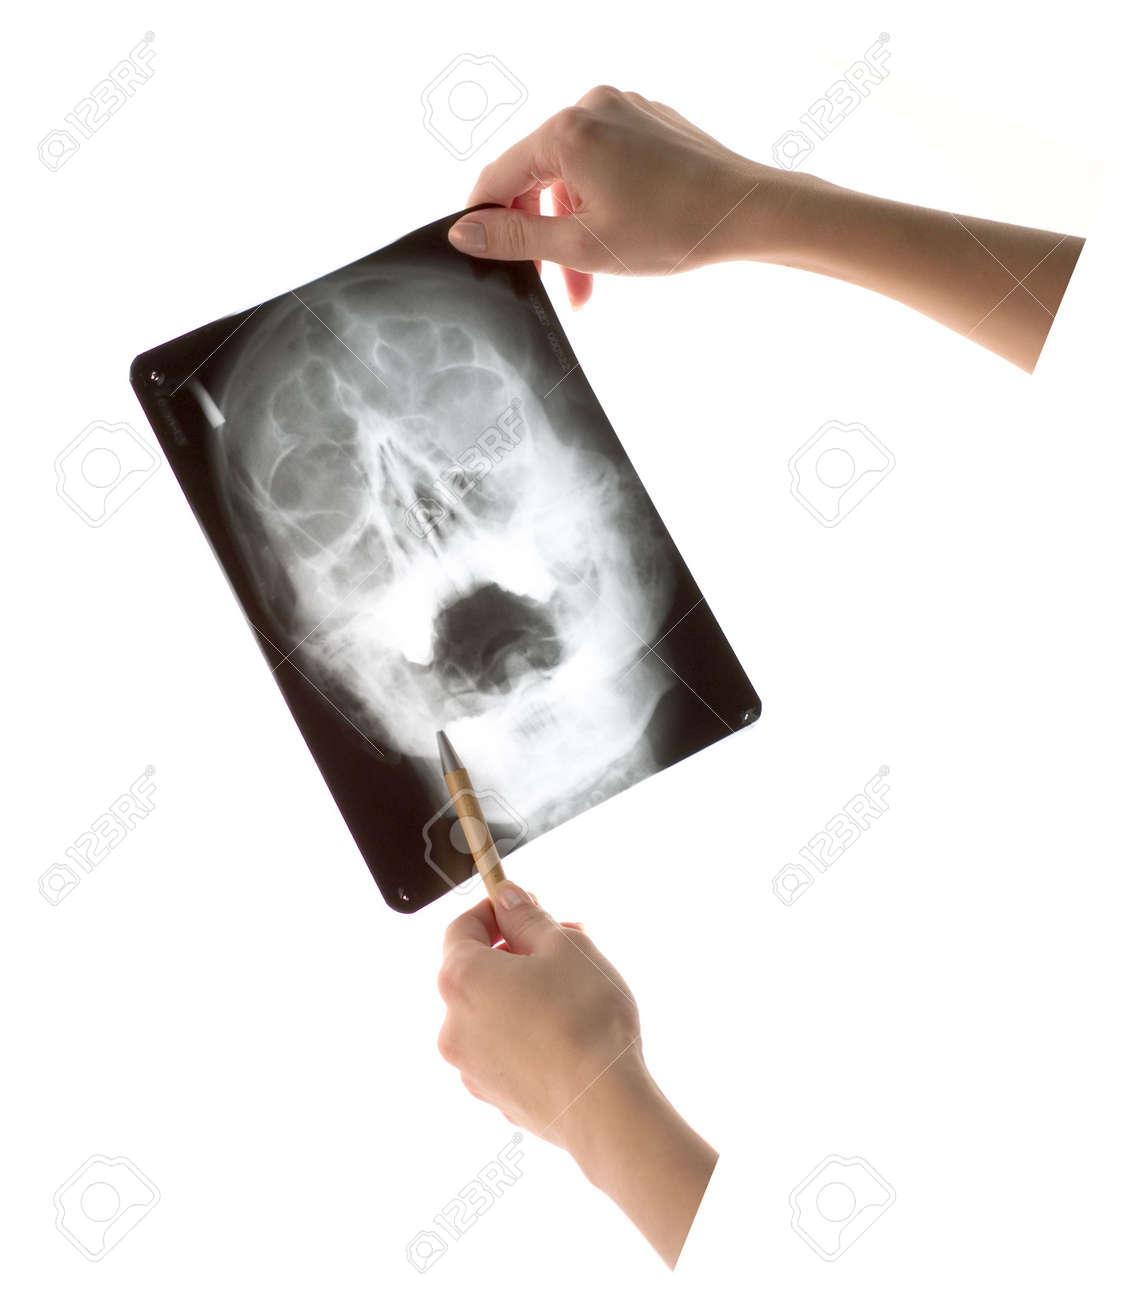 Inspecting x-ray shot Stock Photo - 632366